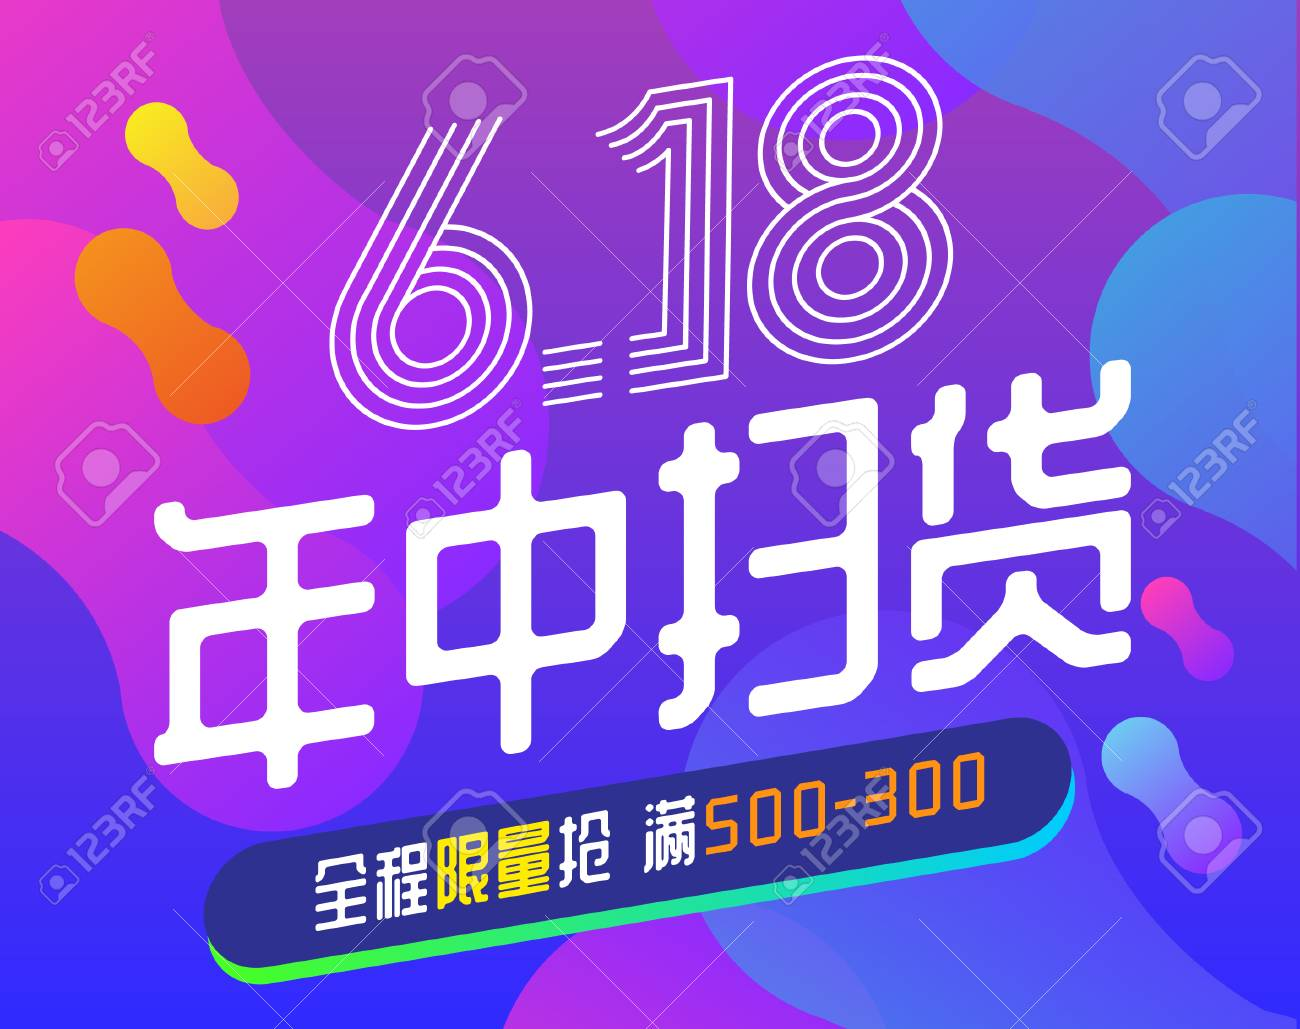 E-commerce internet mega sale event template - 111337896